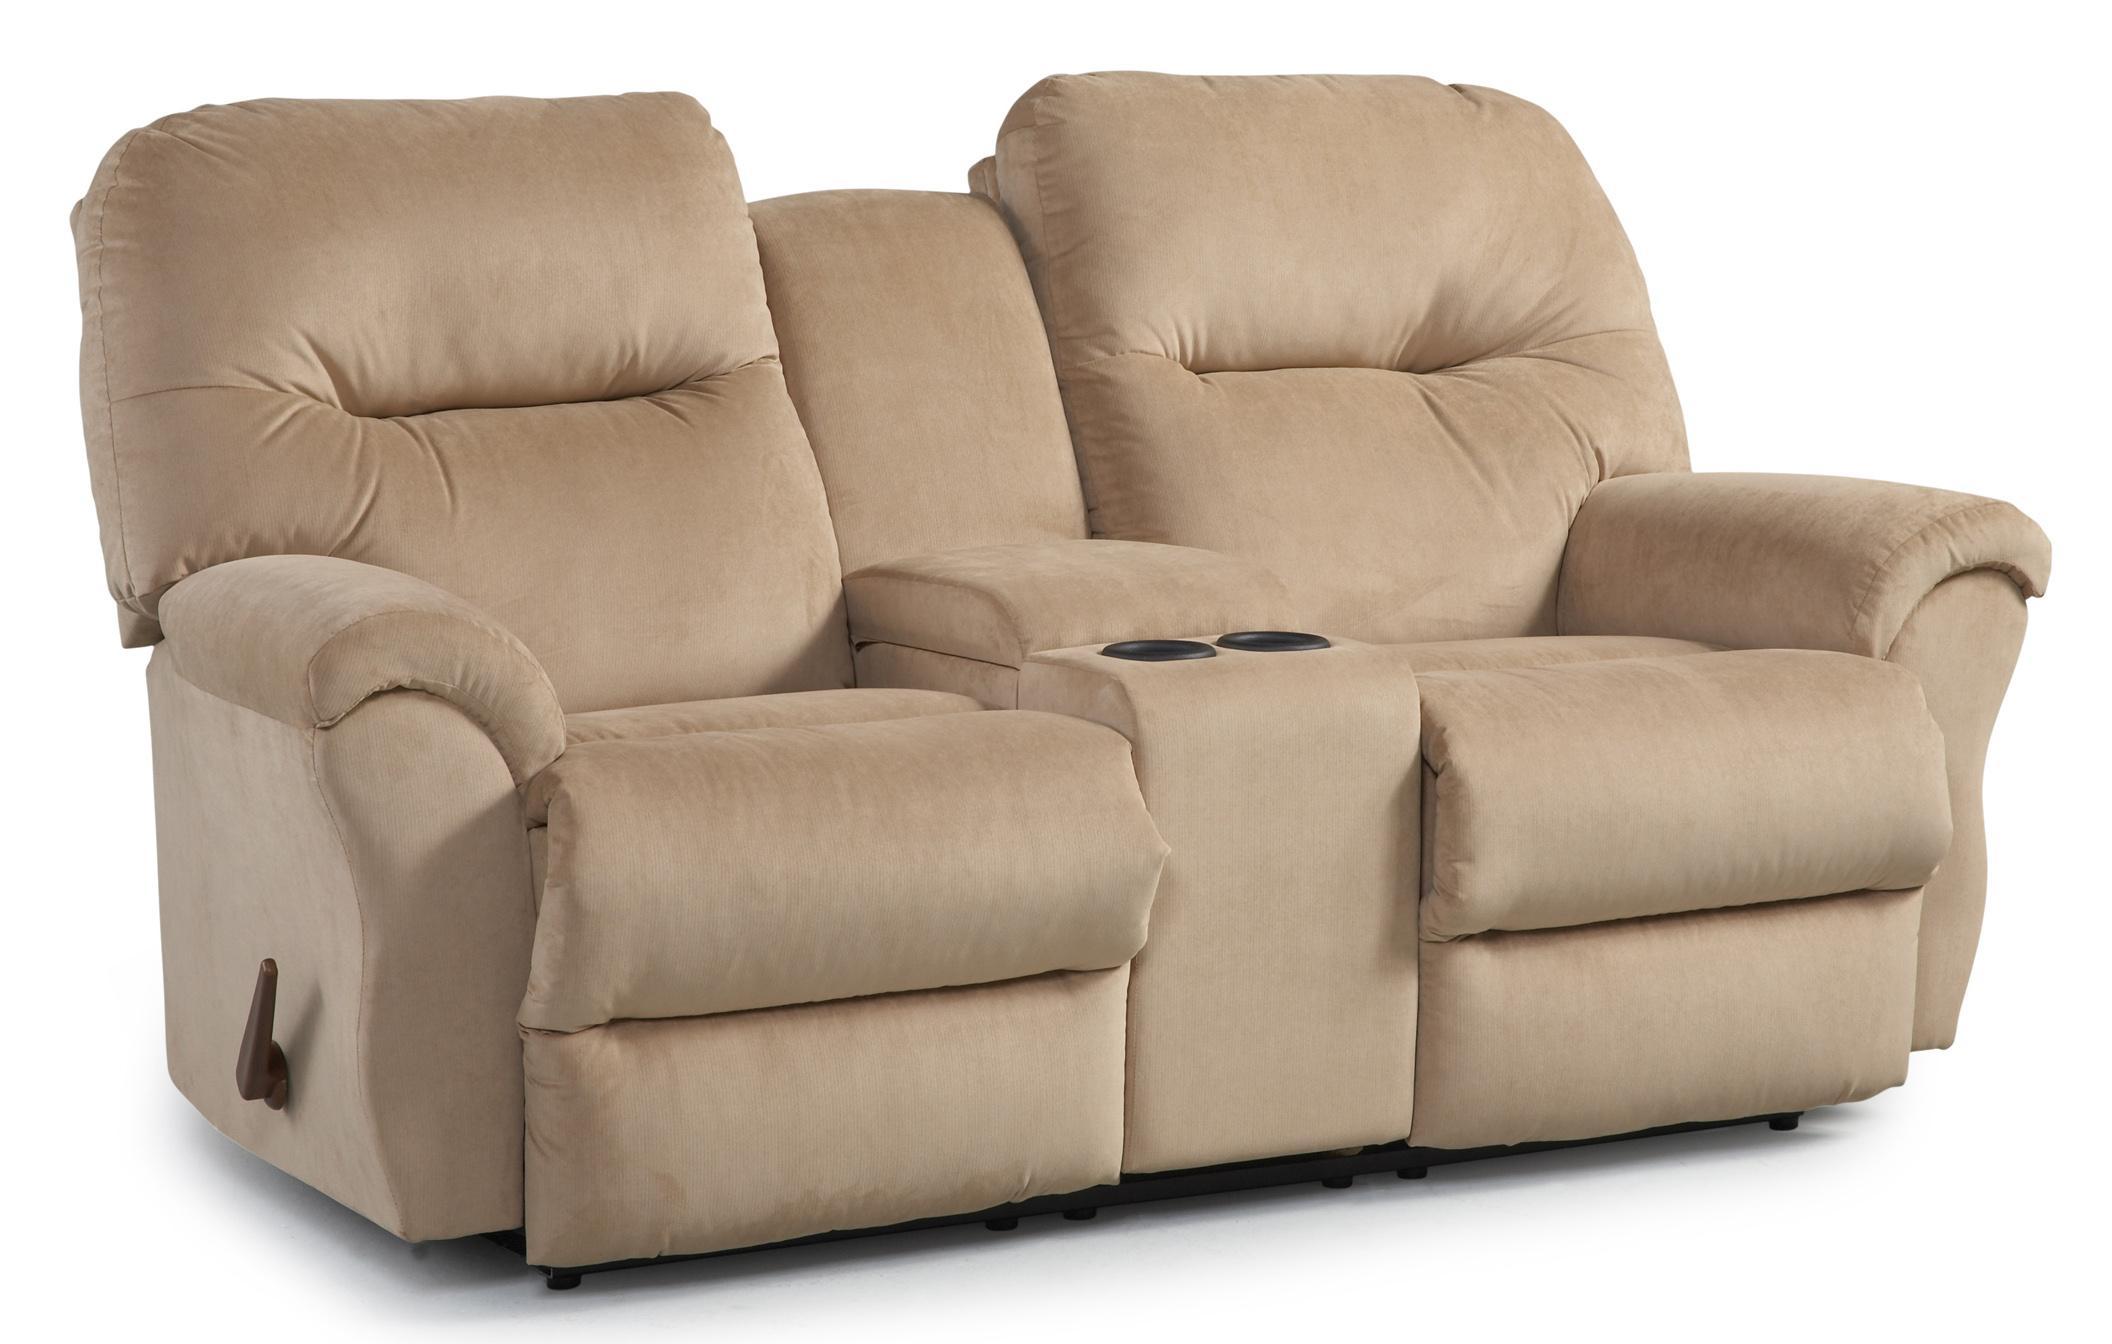 best power reclining sofa set togo nz home furnishings bodie rocking